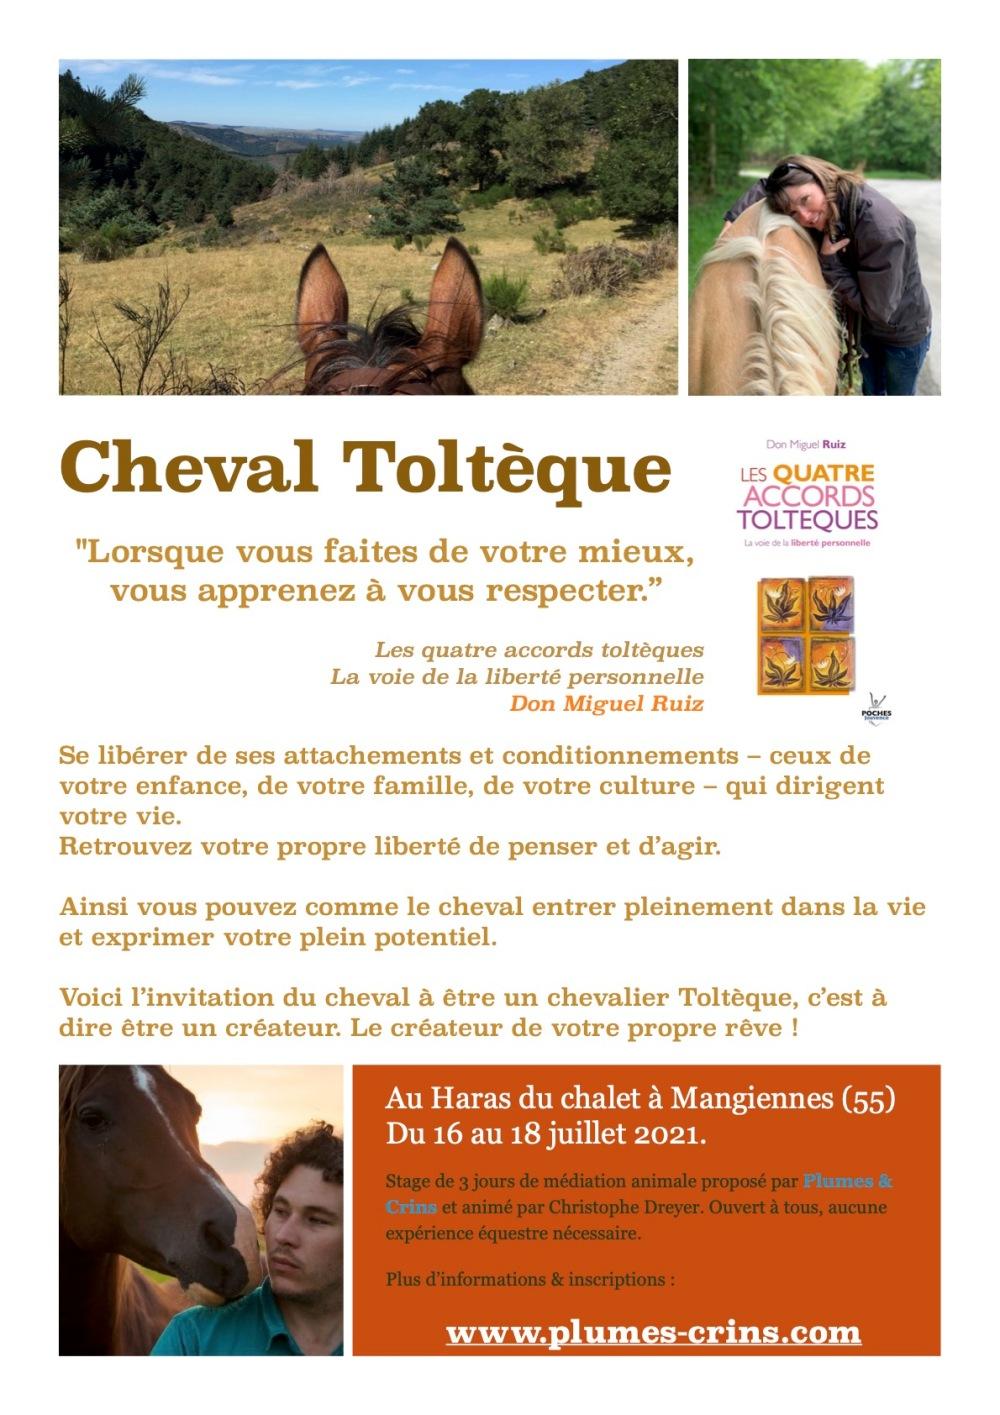 2021-01-07_CD_Tolteque-Affiche-A4_07-2021_v1